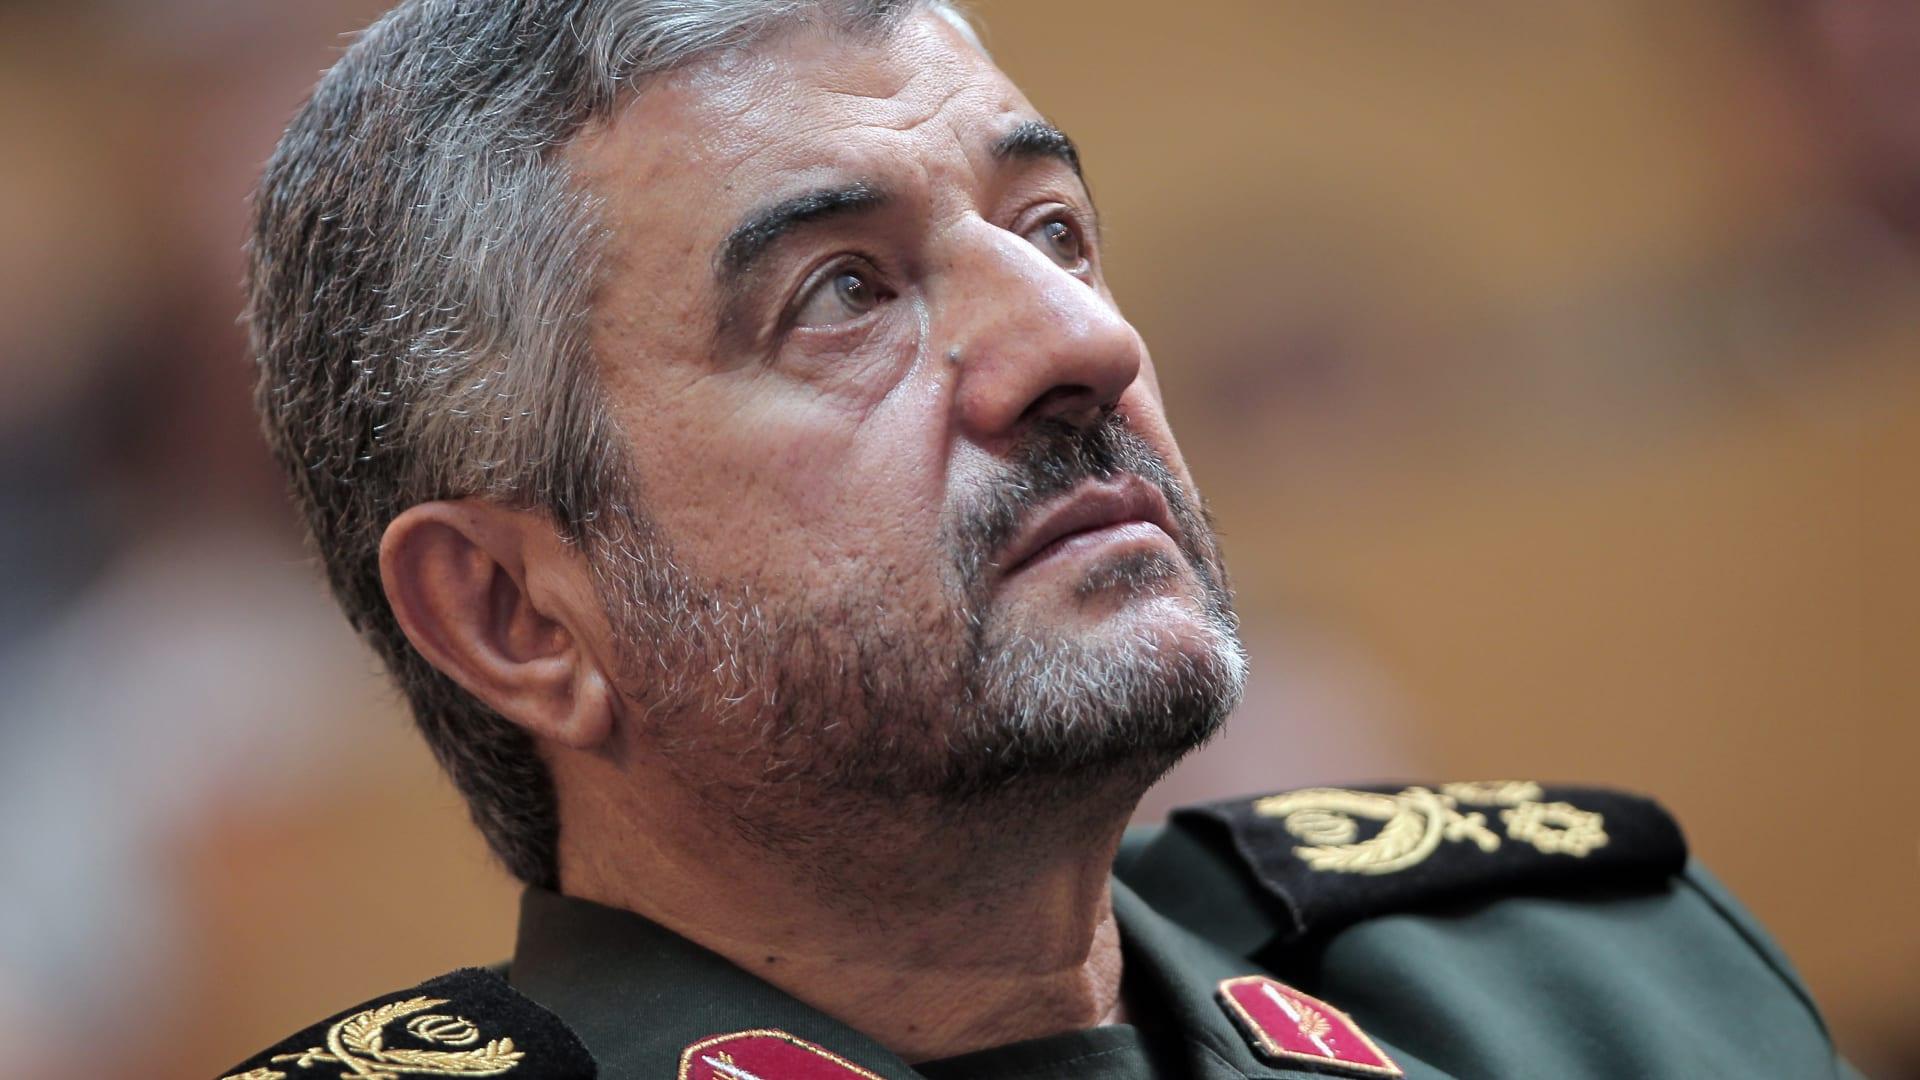 حصري.. كيف توازن روسيا بين أمن إسرائيل وعلاقاتها بإيران؟